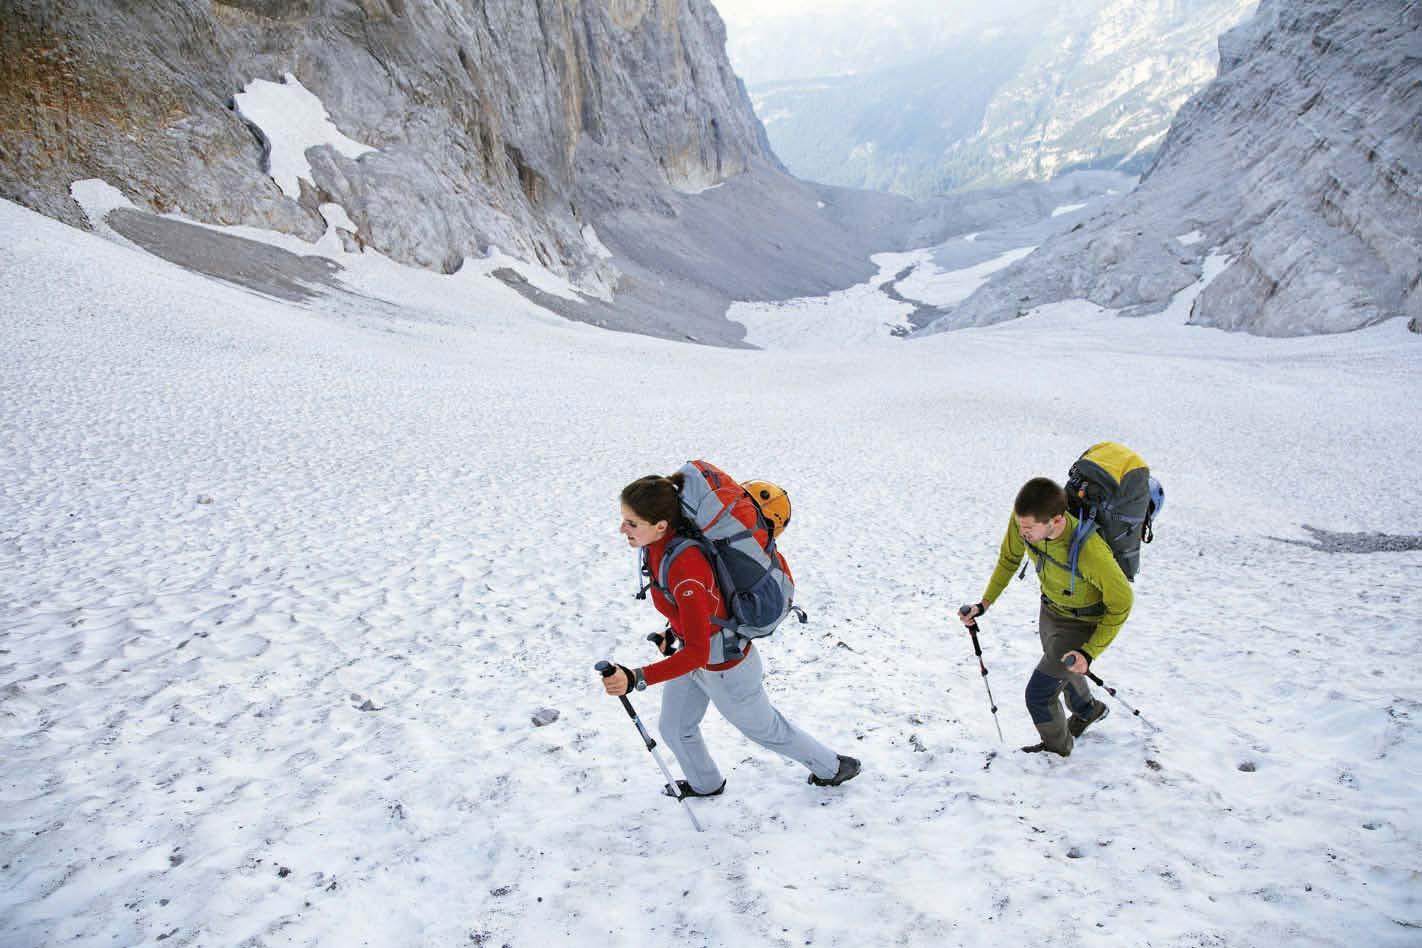 Leichtester Klettergurt Welt : Packwunder hochtourenrucksäcke im test bergsteiger magazin